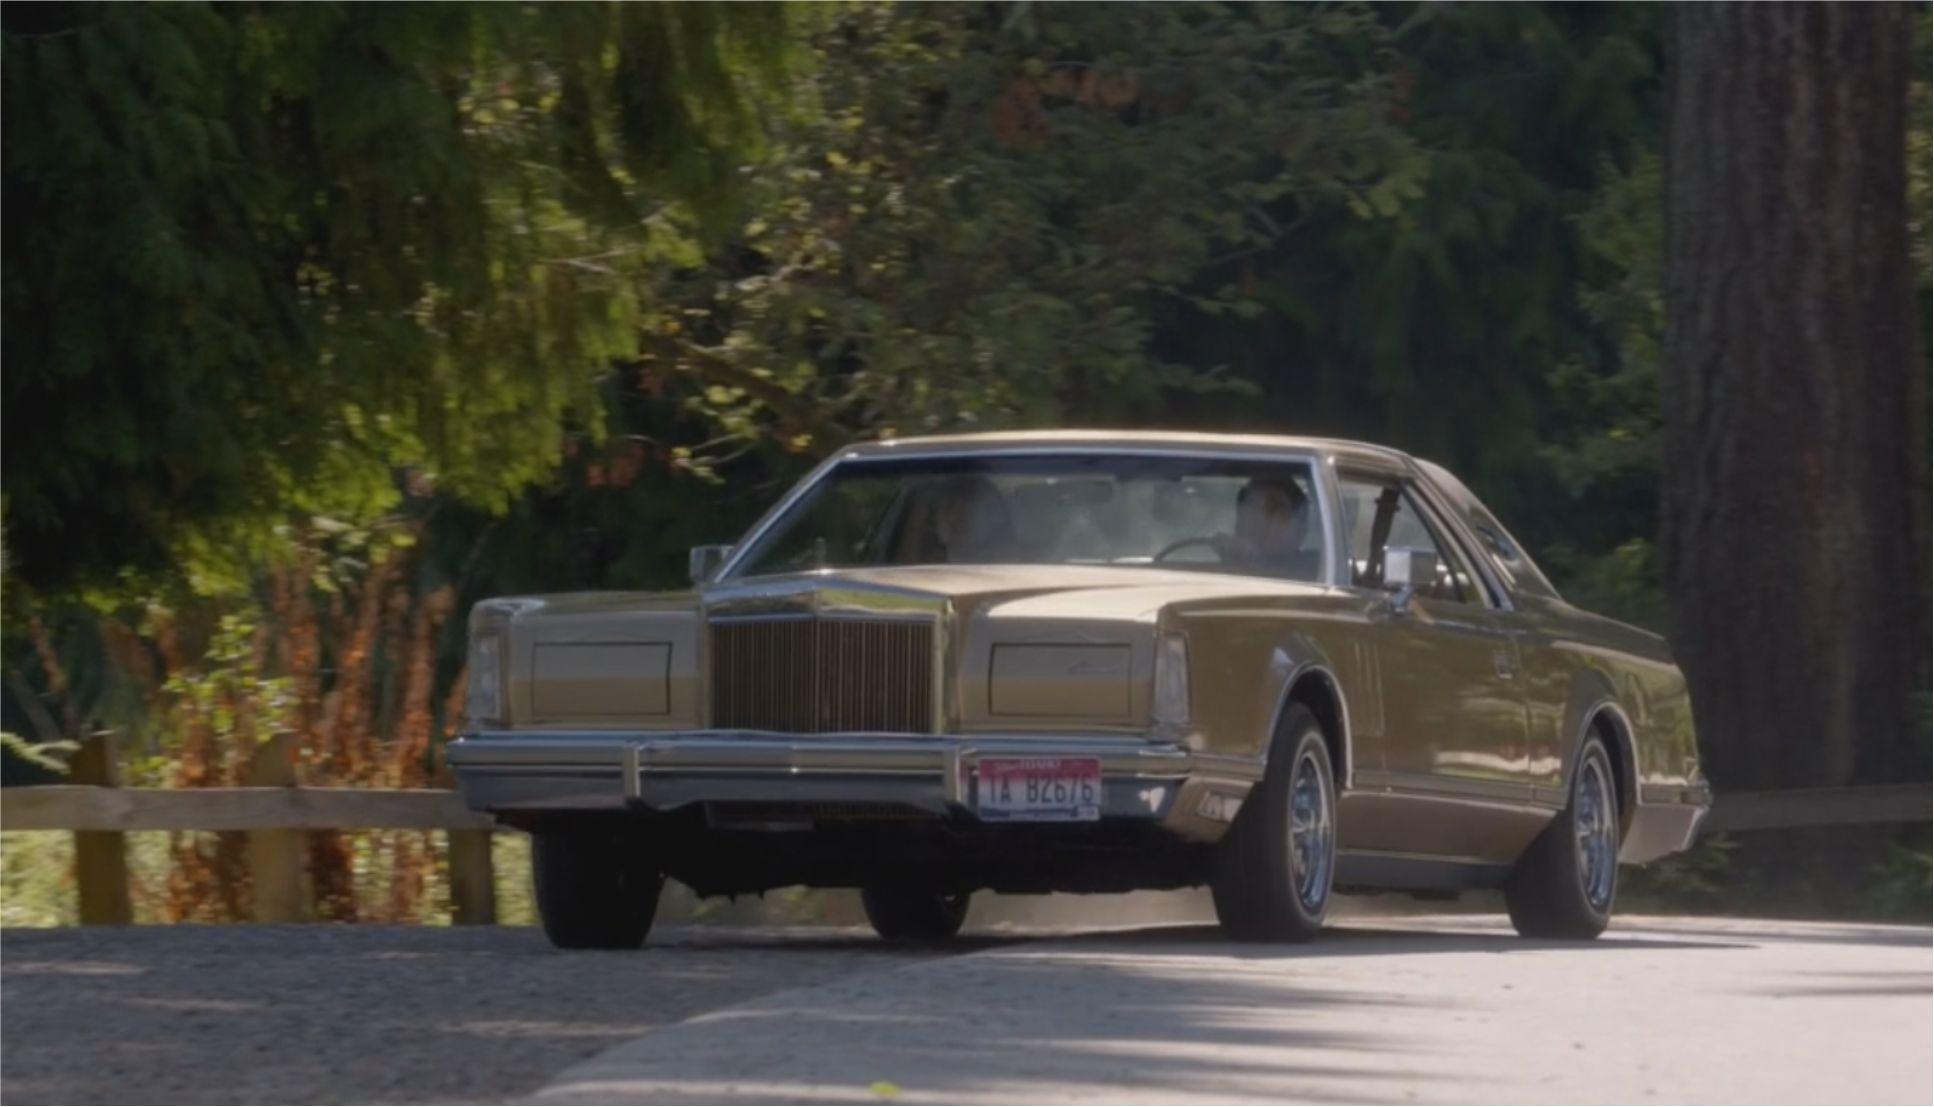 Castiel's Pimpmobile